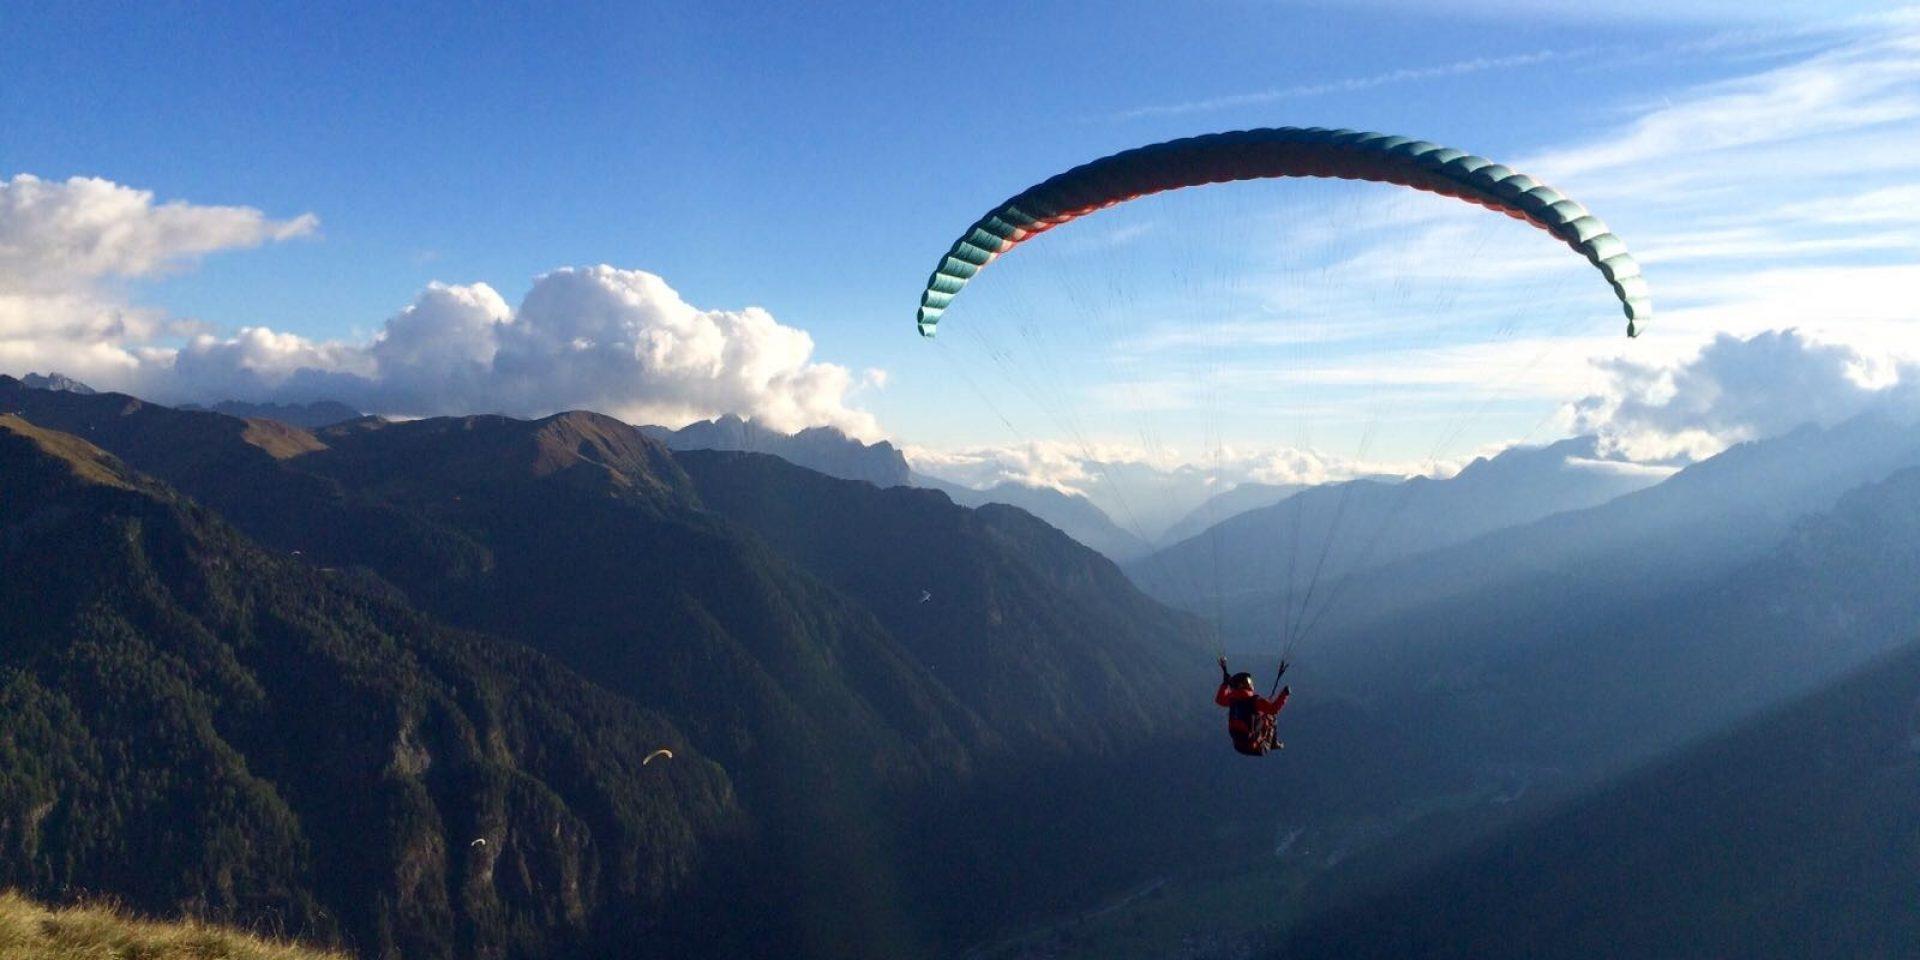 Sunrise paraglindingflight